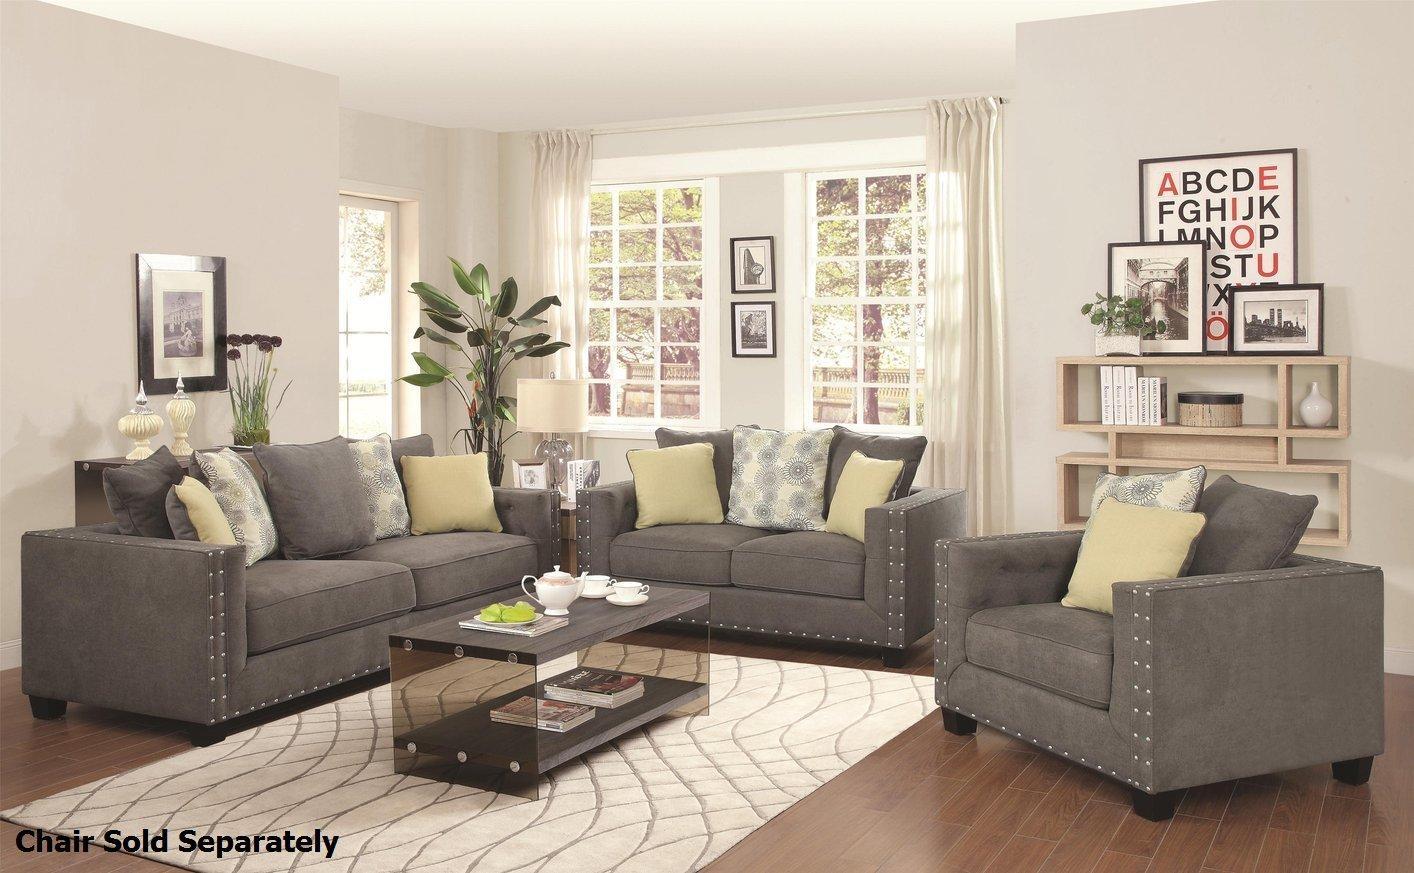 20 Inspirations Living Room Sofa and Chair Sets | Sofa Ideas